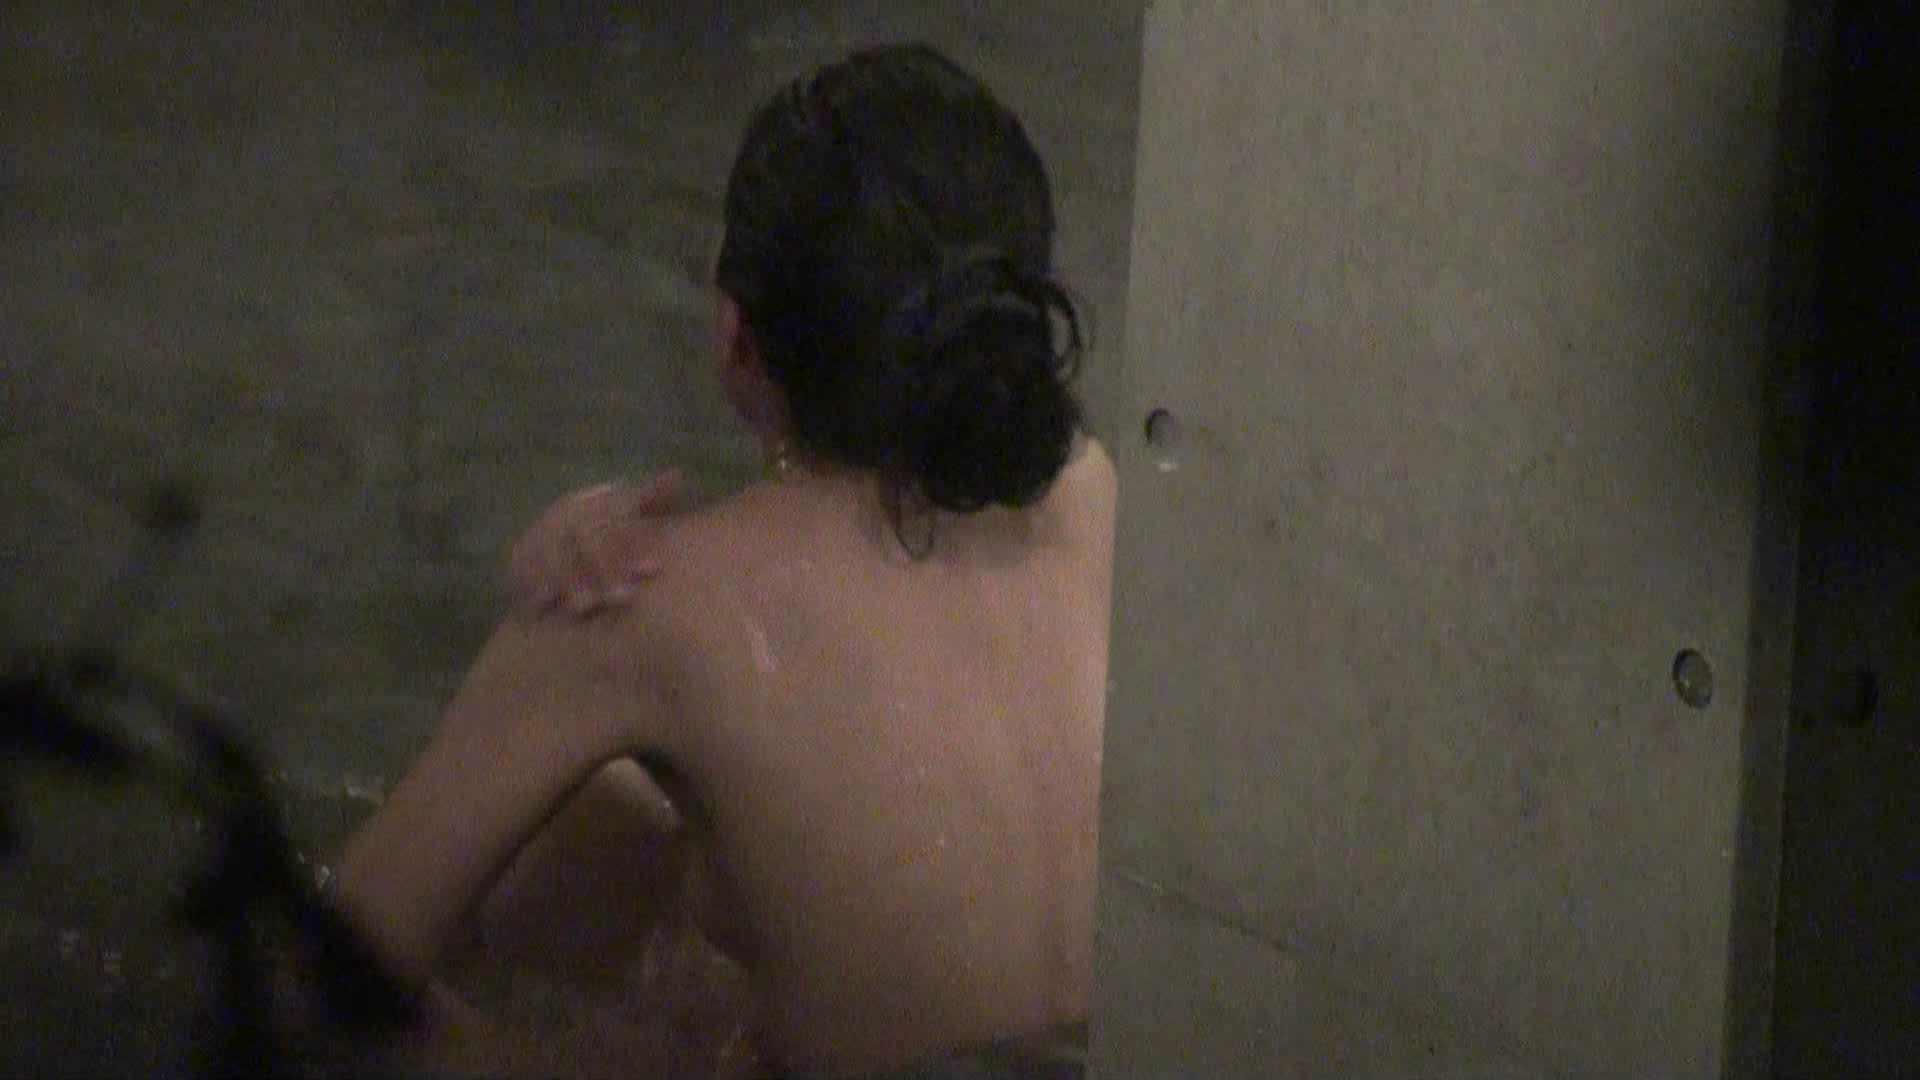 Aquaな露天風呂Vol.375 OLエロ画像 盗撮おめこ無修正動画無料 78PICs 74